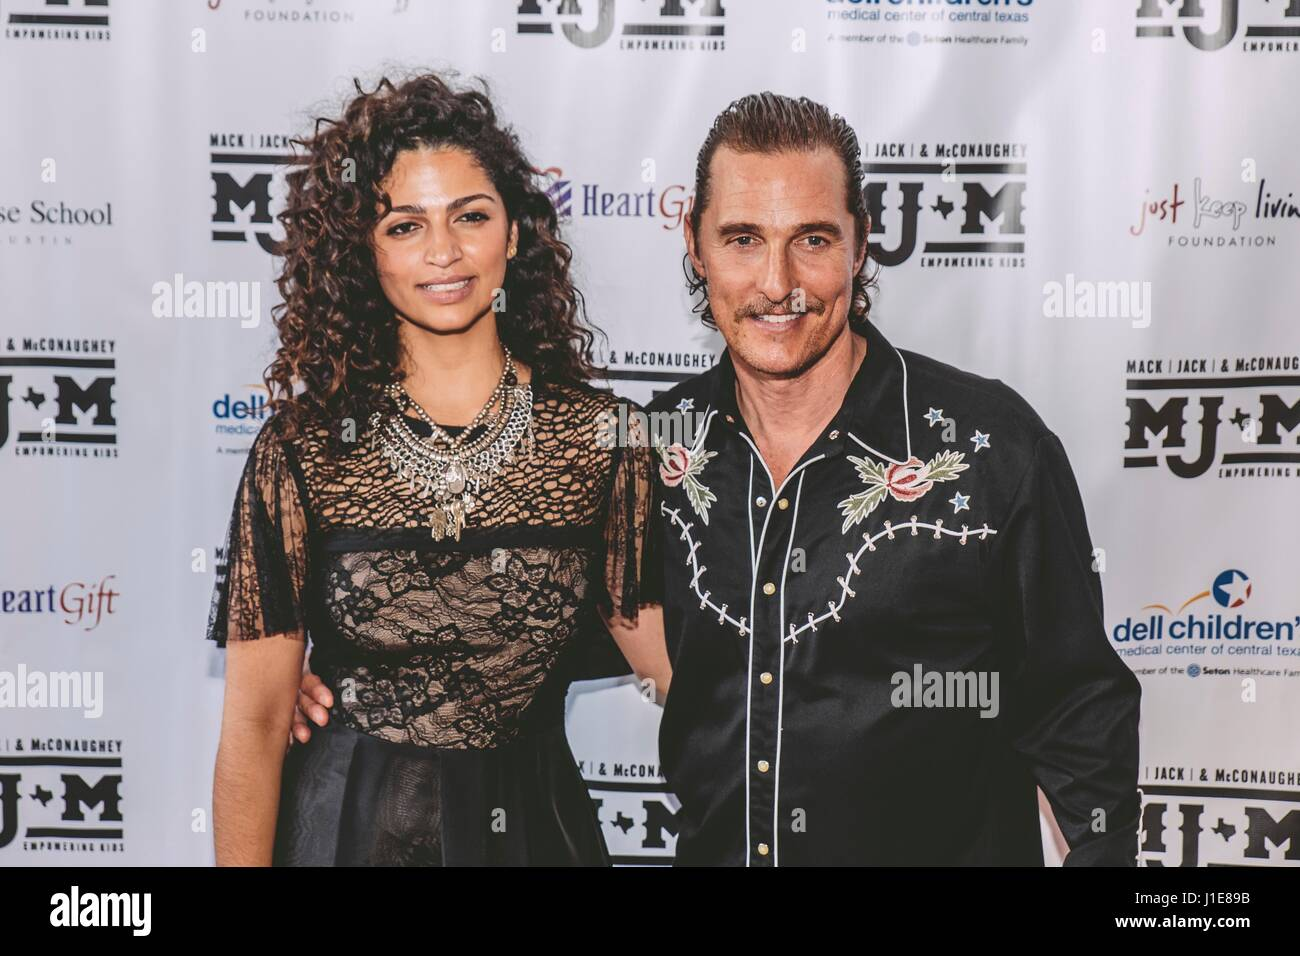 Austin, USA. 20th Apr, 2017. Camila Alves, Matthew McConaughey arrive at the 2017 Mack, Jack & McConaughey on - Stock Image